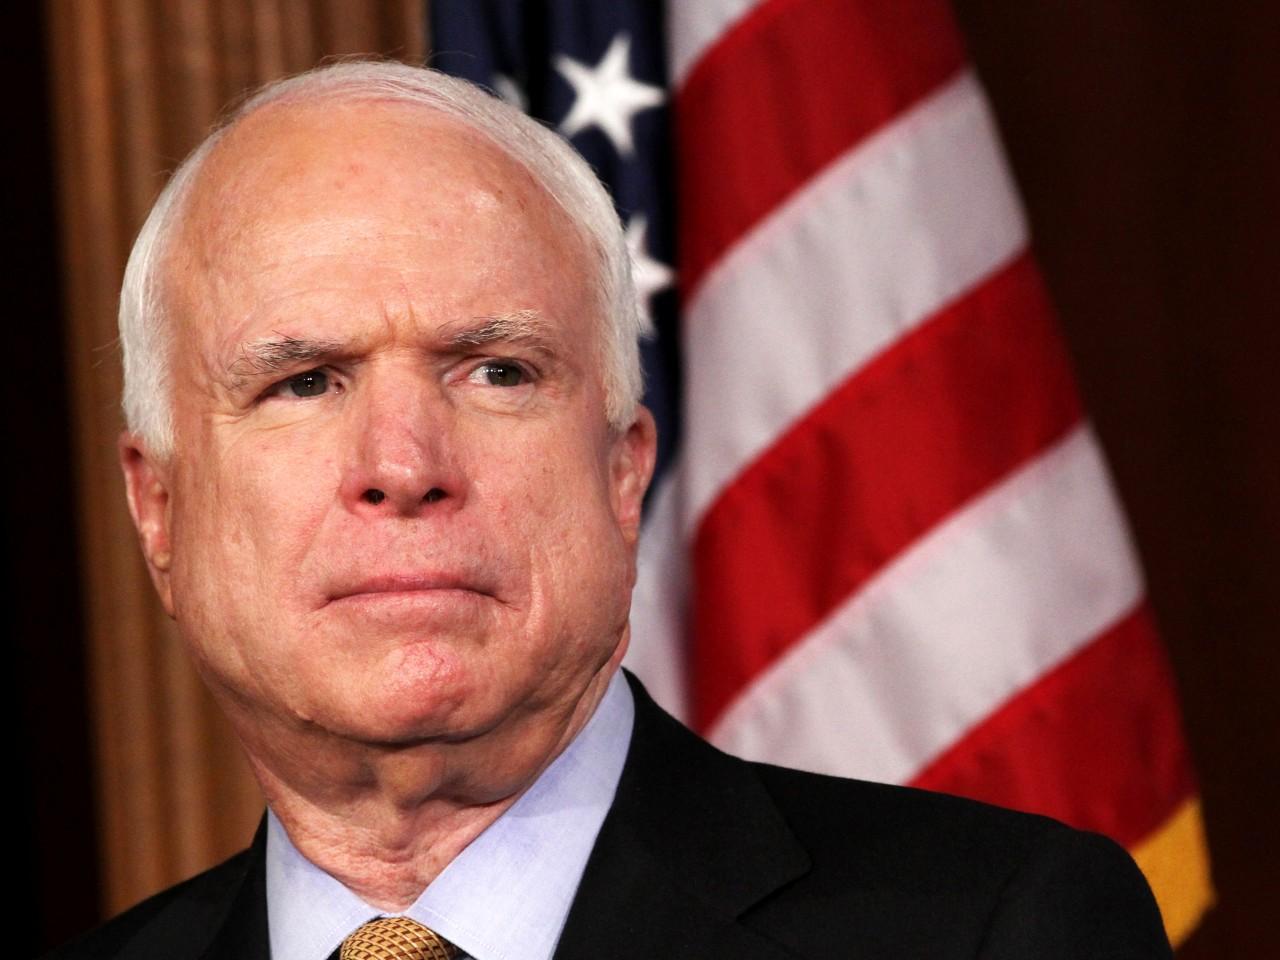 John McCain, influente senador dos EUA e candidato à presidência, morre aos 81 anos